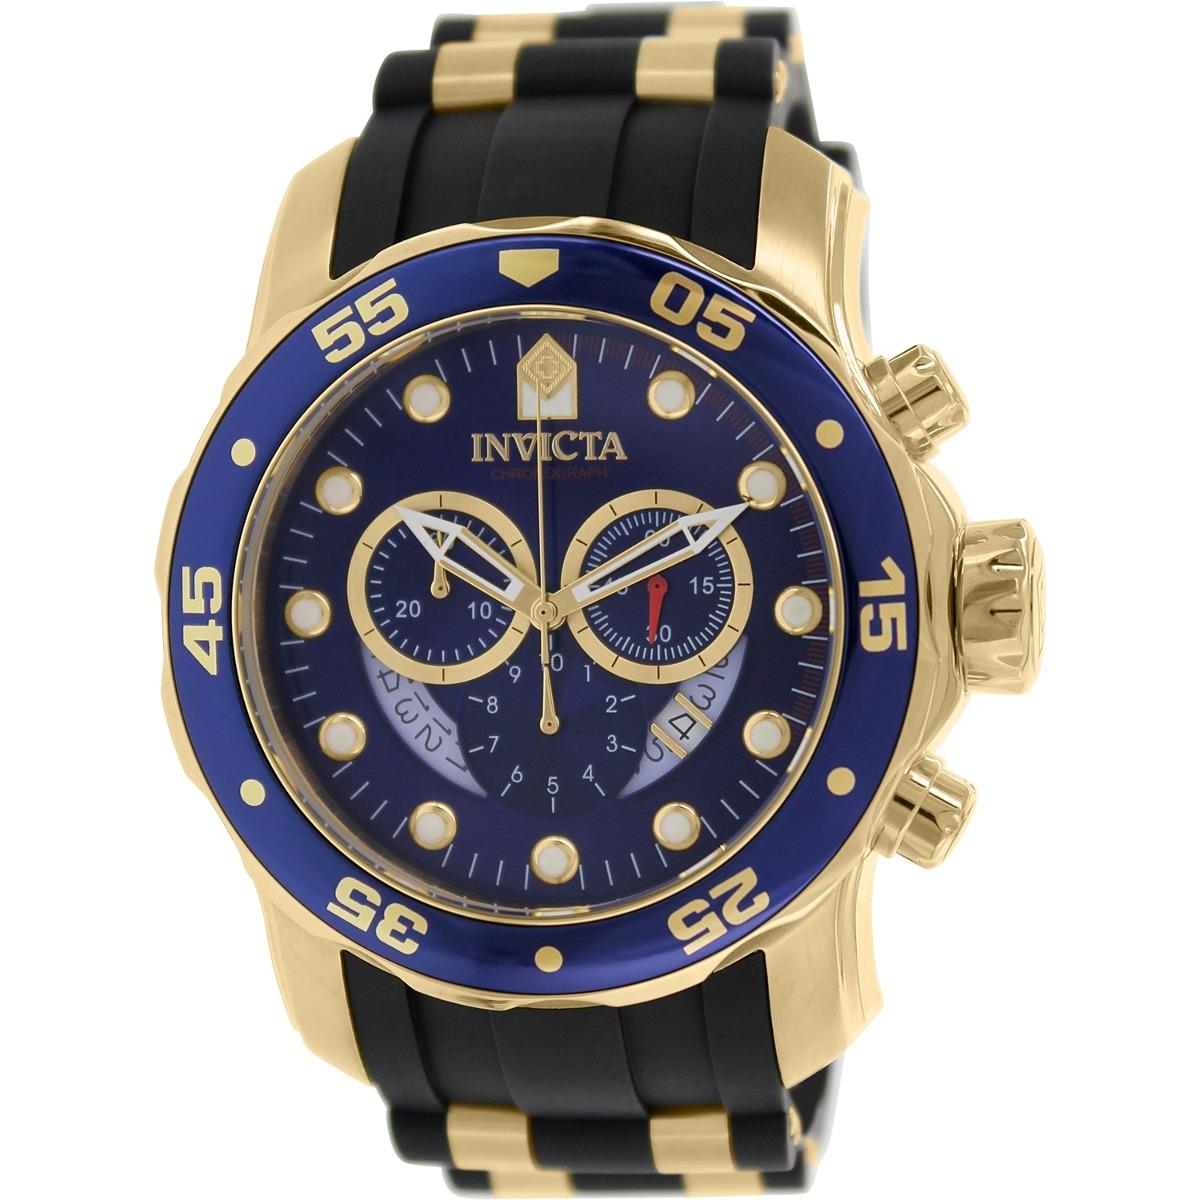 f475bec240a0 Reloj Invicta Para Hombre 6983 Pro Diver Negro Y Esfera Azul ...